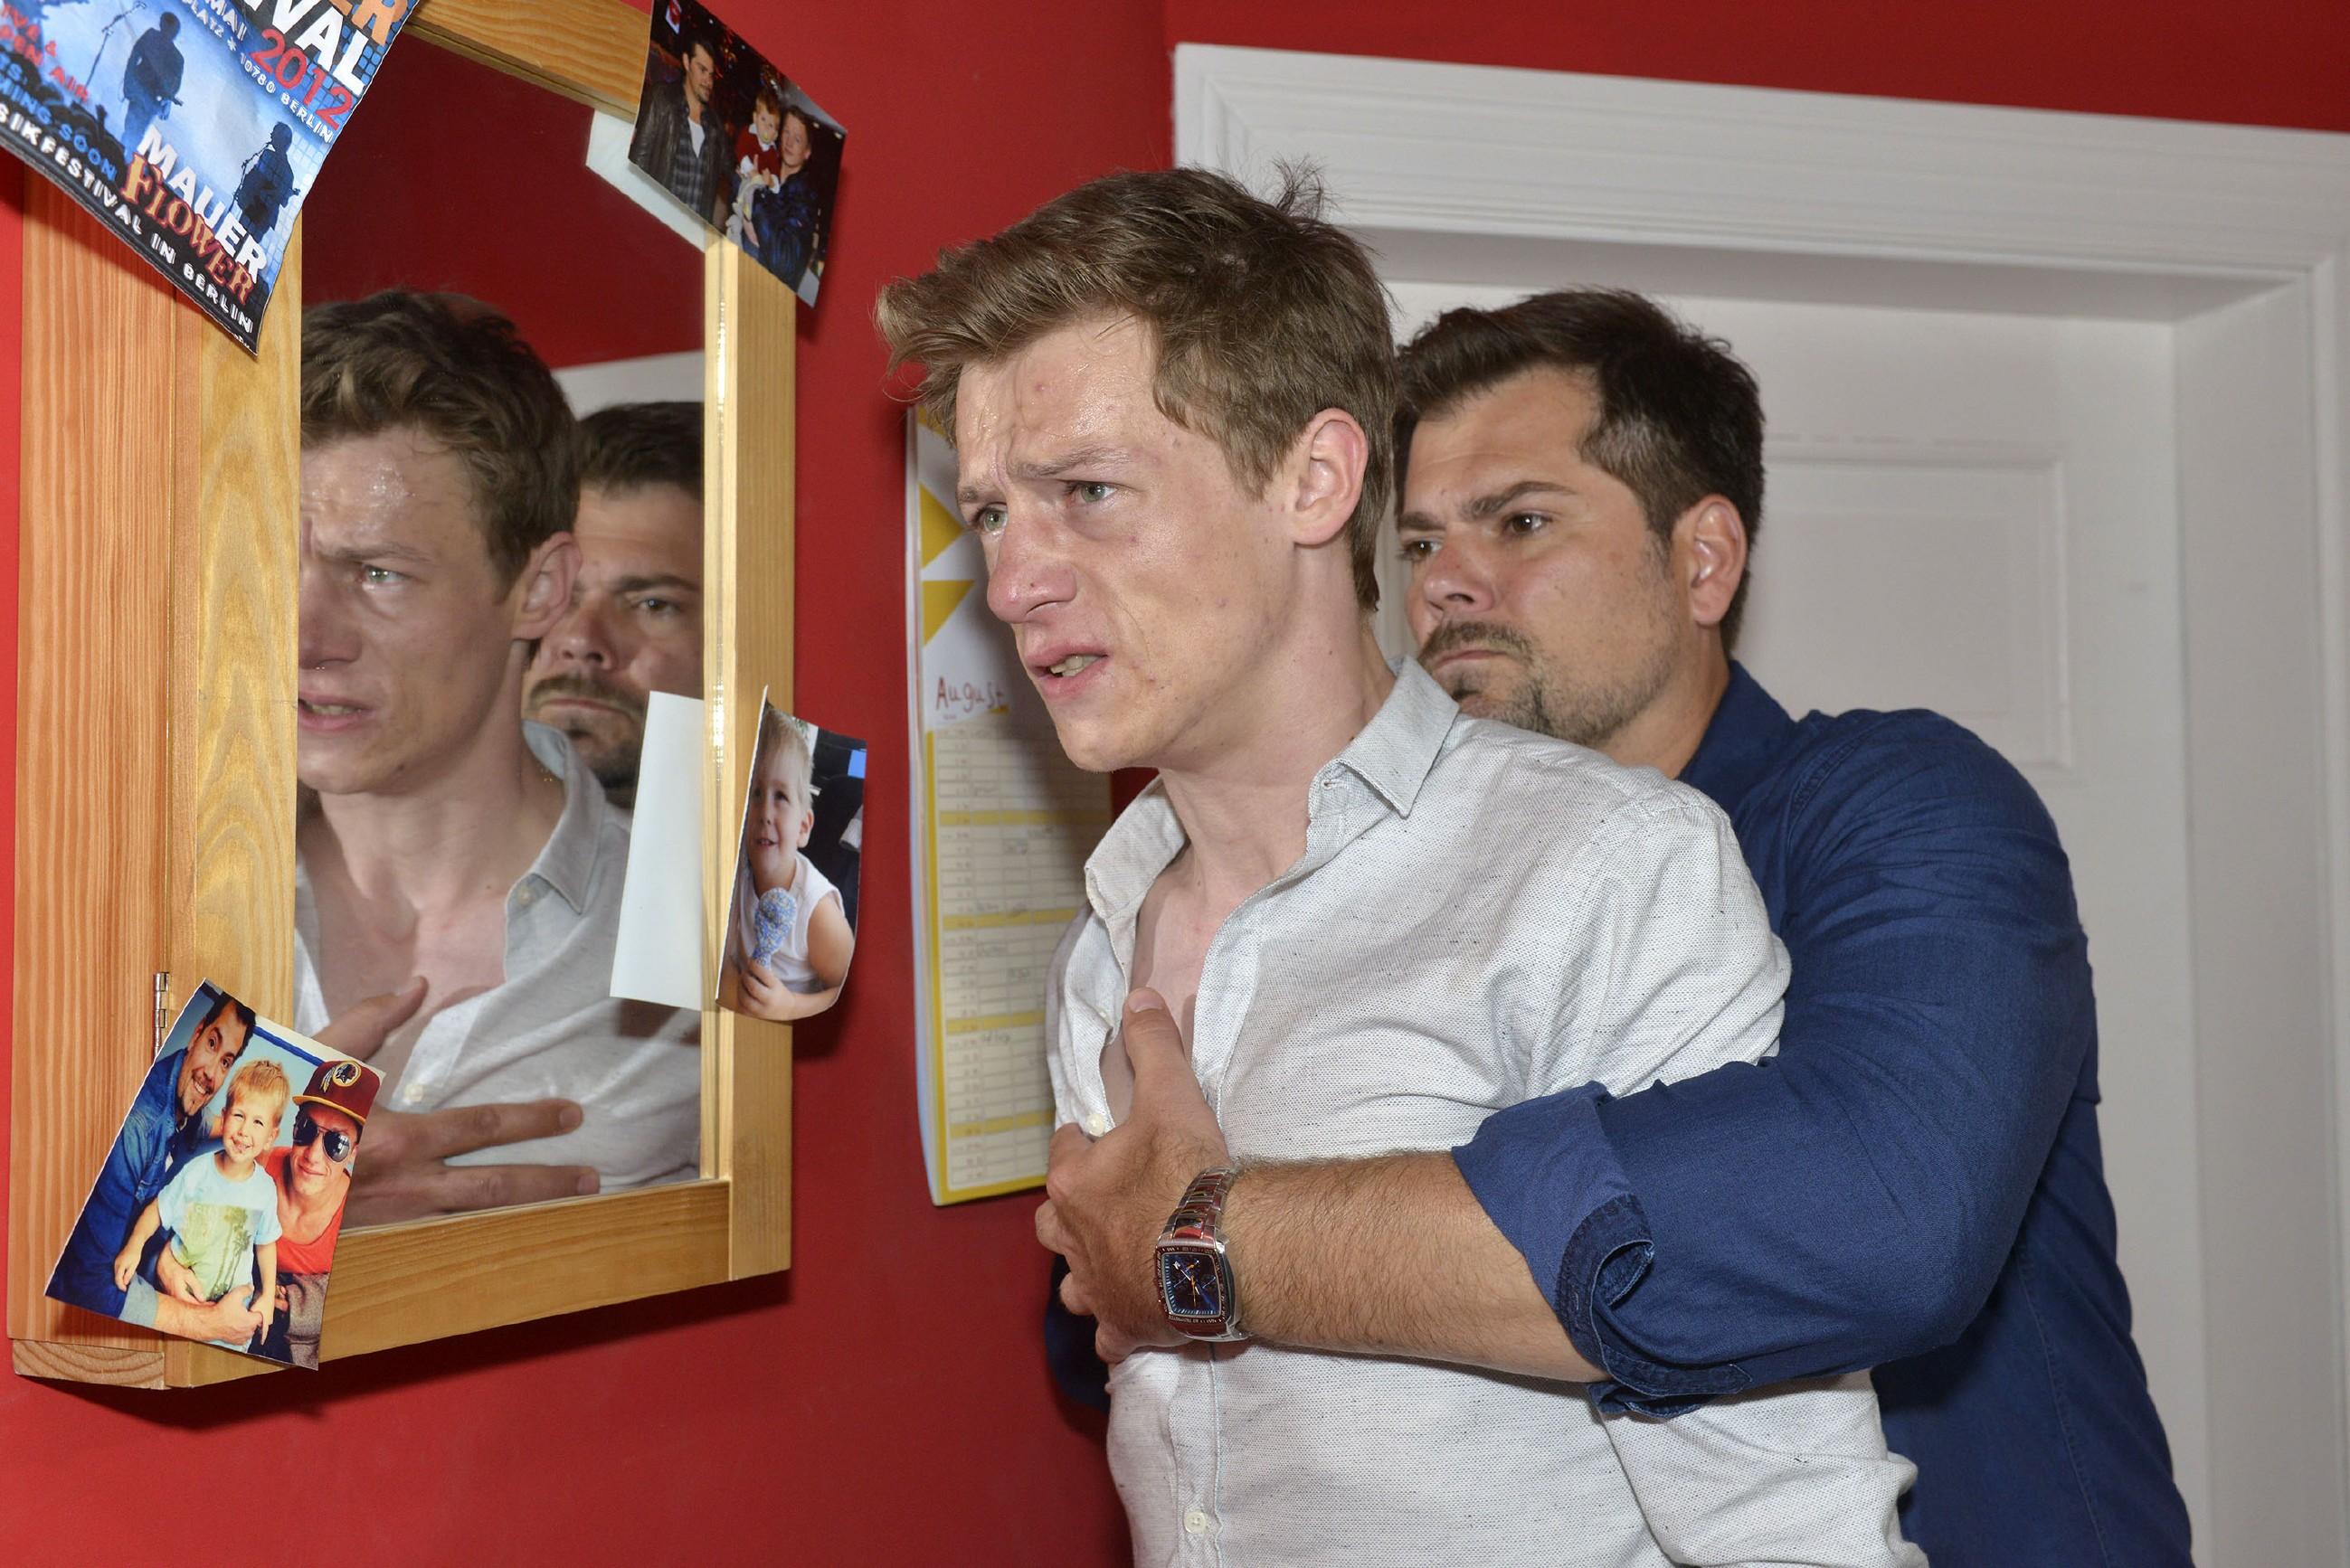 Leon (Daniel Fehlow, r.) will nicht zulassen, dass Vince (Vincent Krüger) weiter abstürzt... (Quelle: RTL / Rolf Baumgartner)